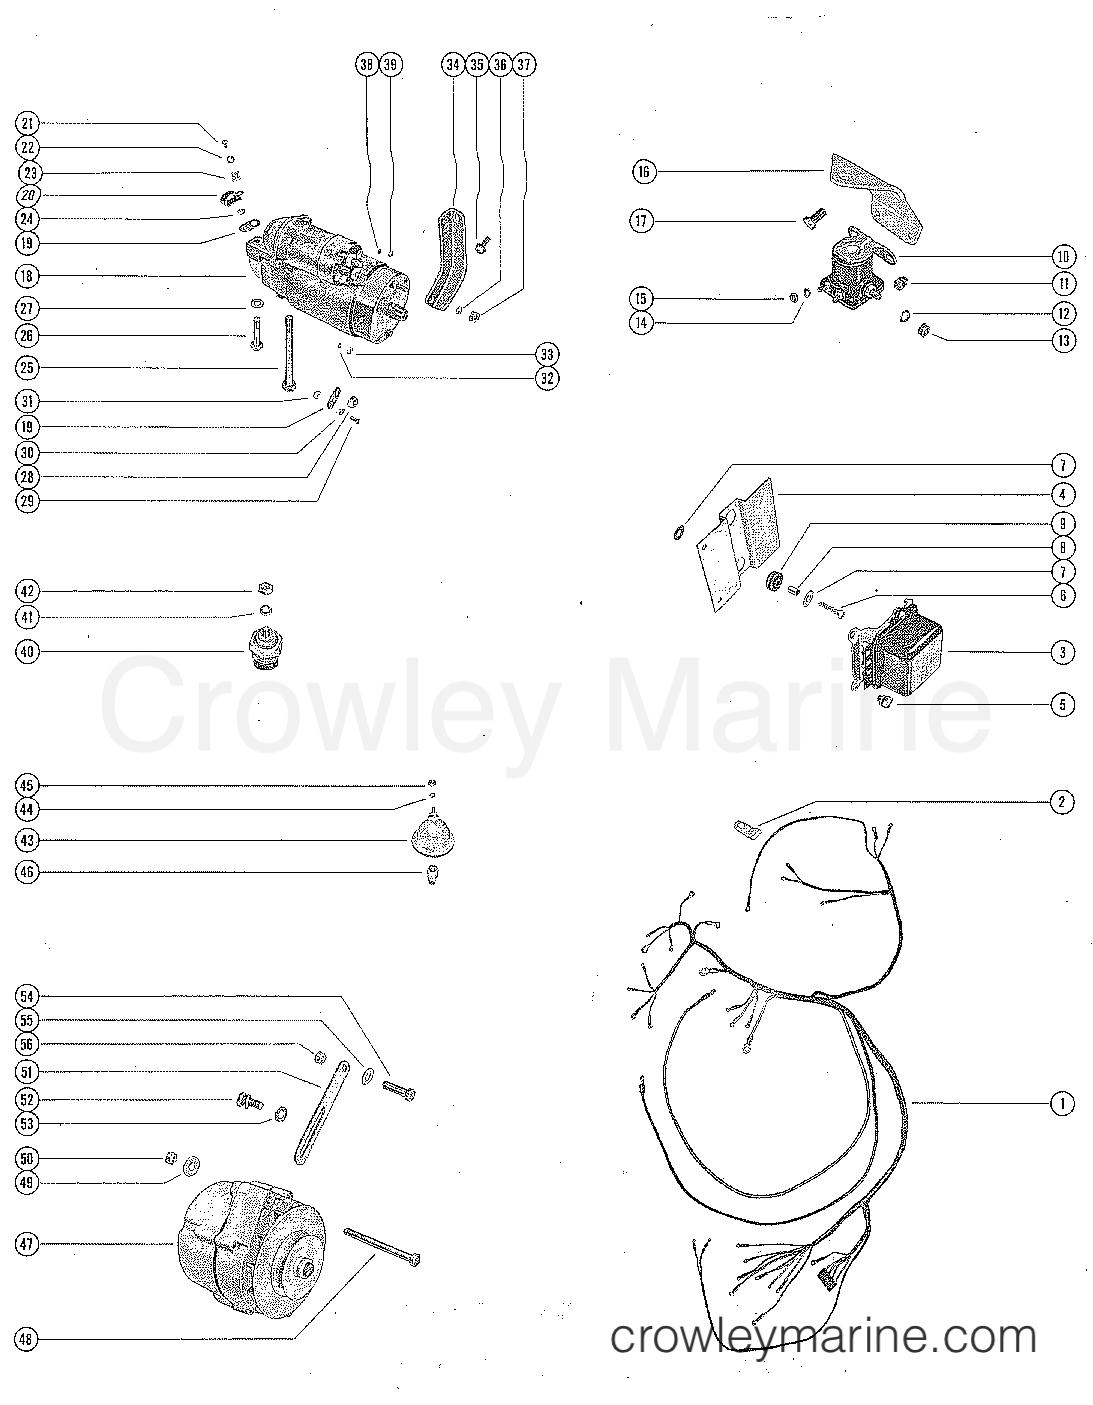 Avital Wiring Diagram 01 Camry